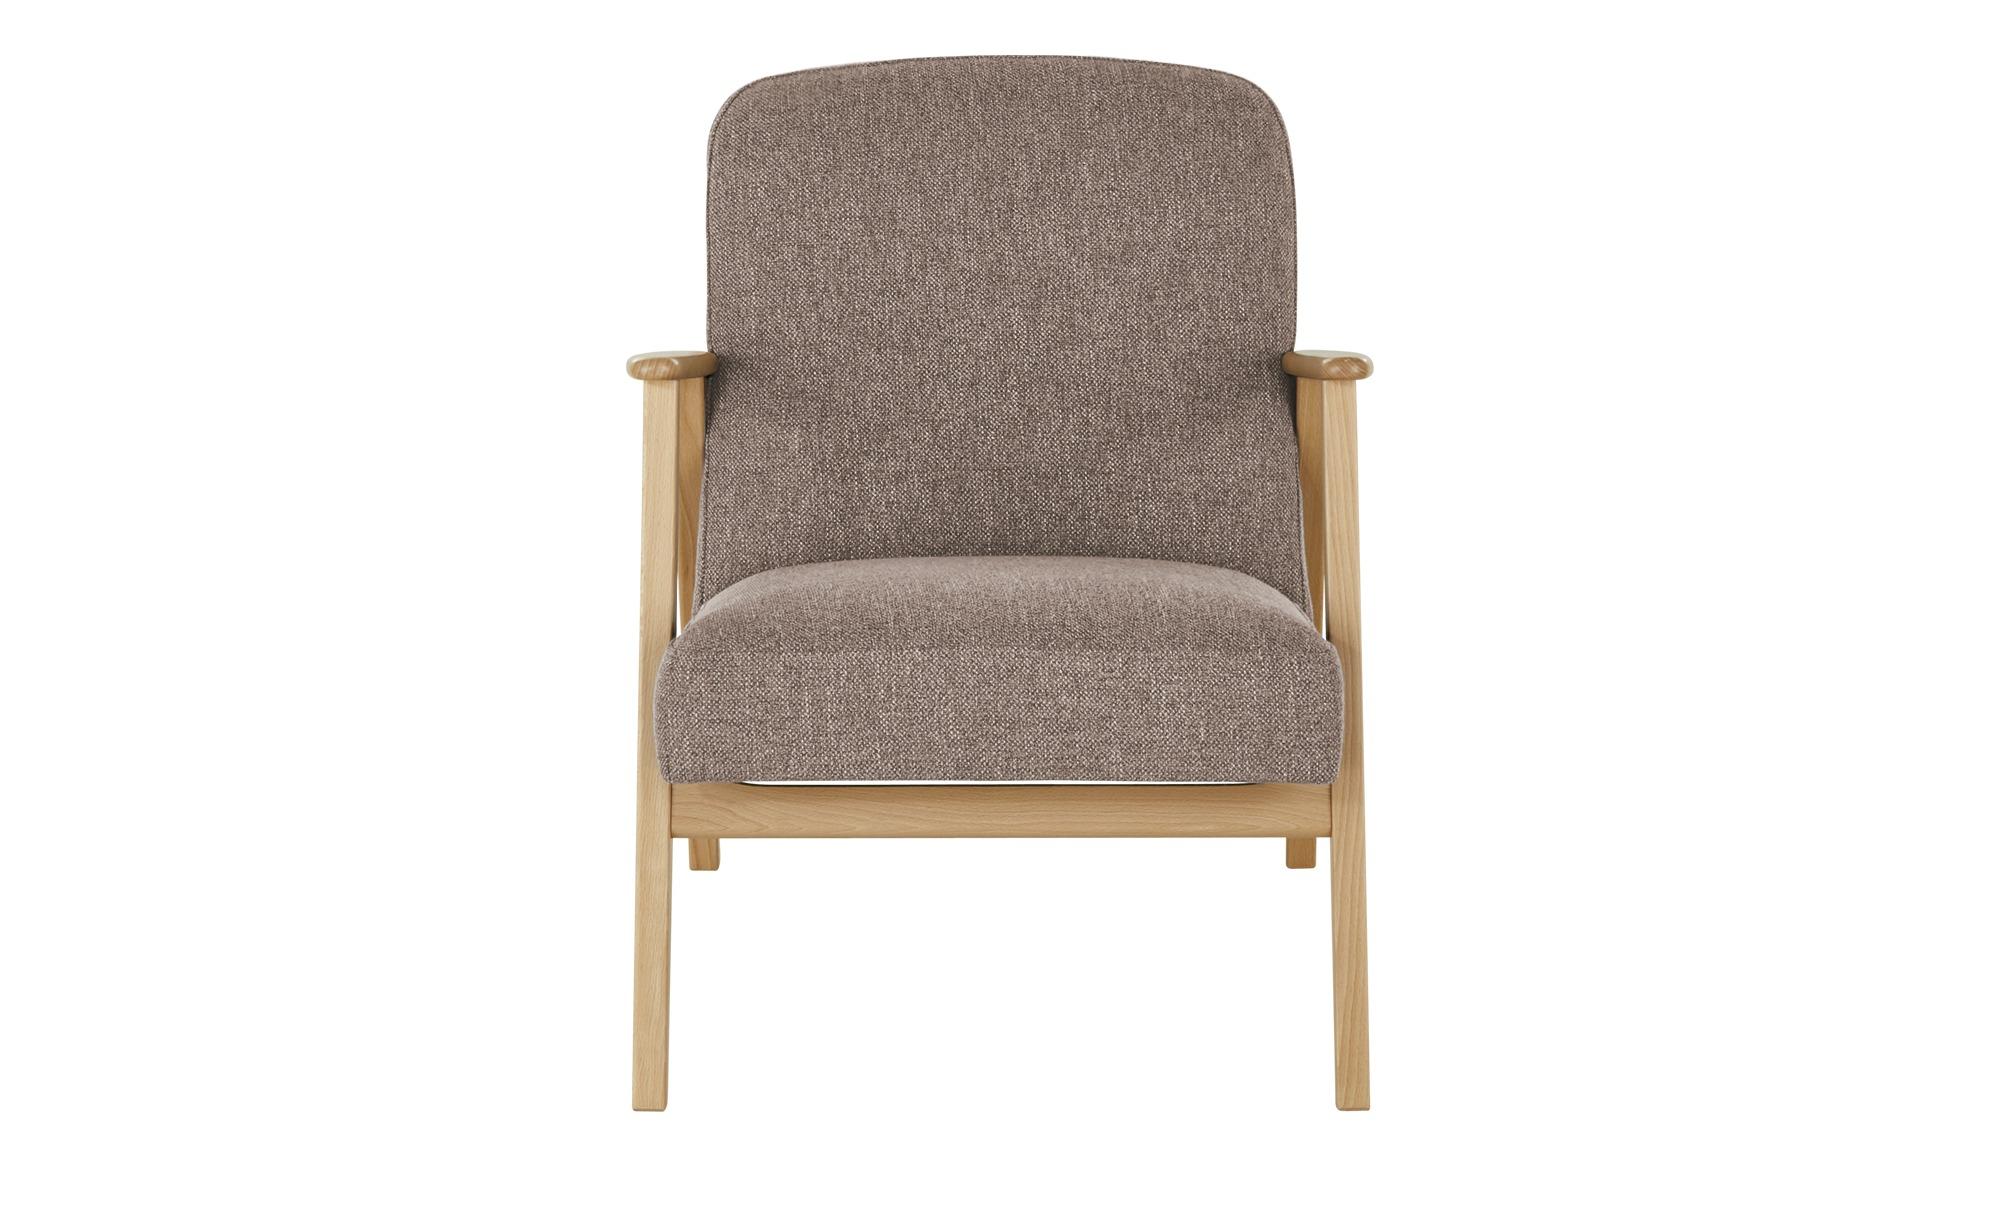 smart Sessel  Rada ¦ braun ¦ Maße (cm): B: 64 H: 76 T: 83 Polstermöbel > Sessel > Polstersessel - Höffner